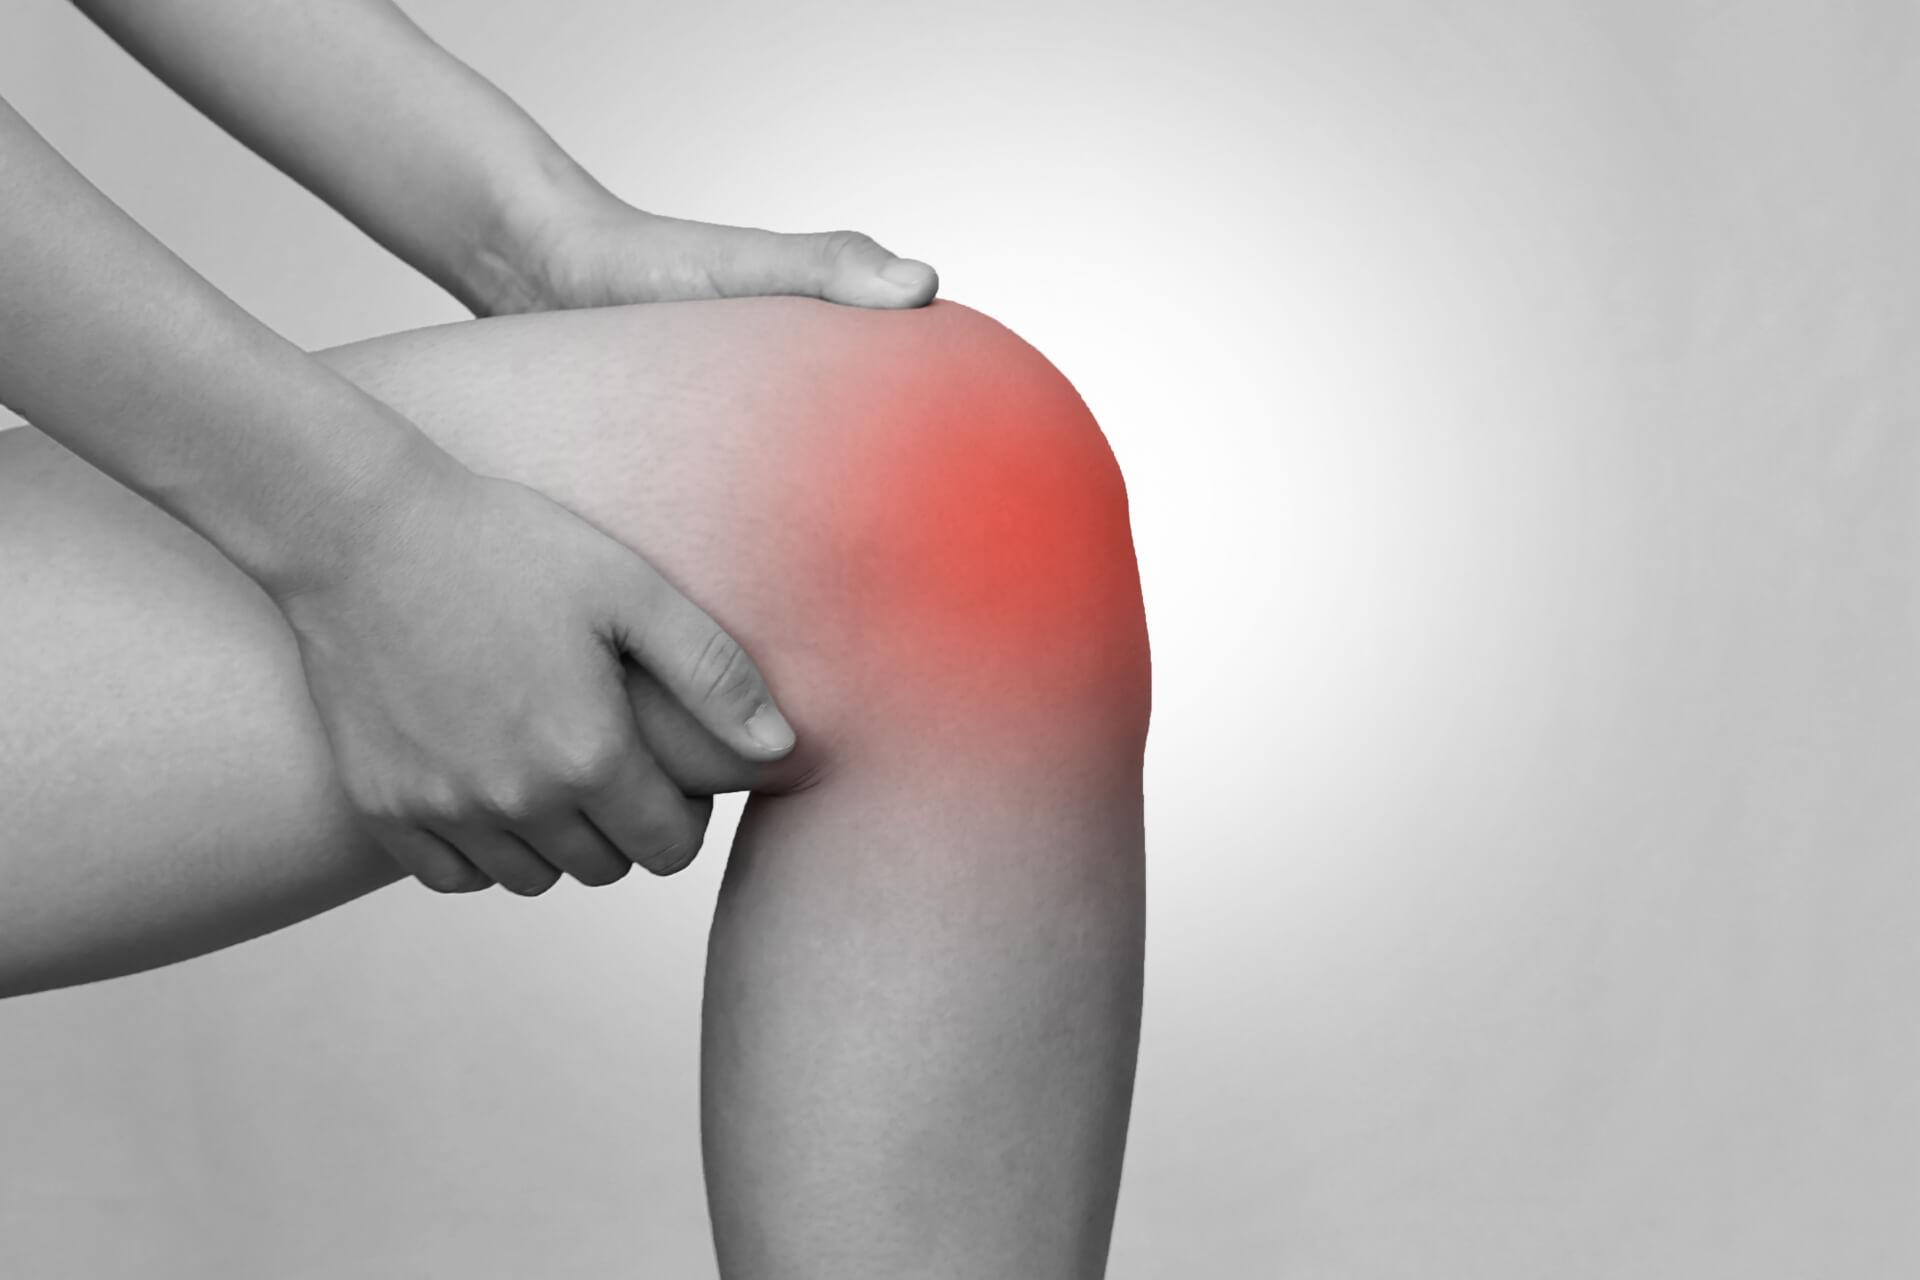 変形性膝関節症と湿布